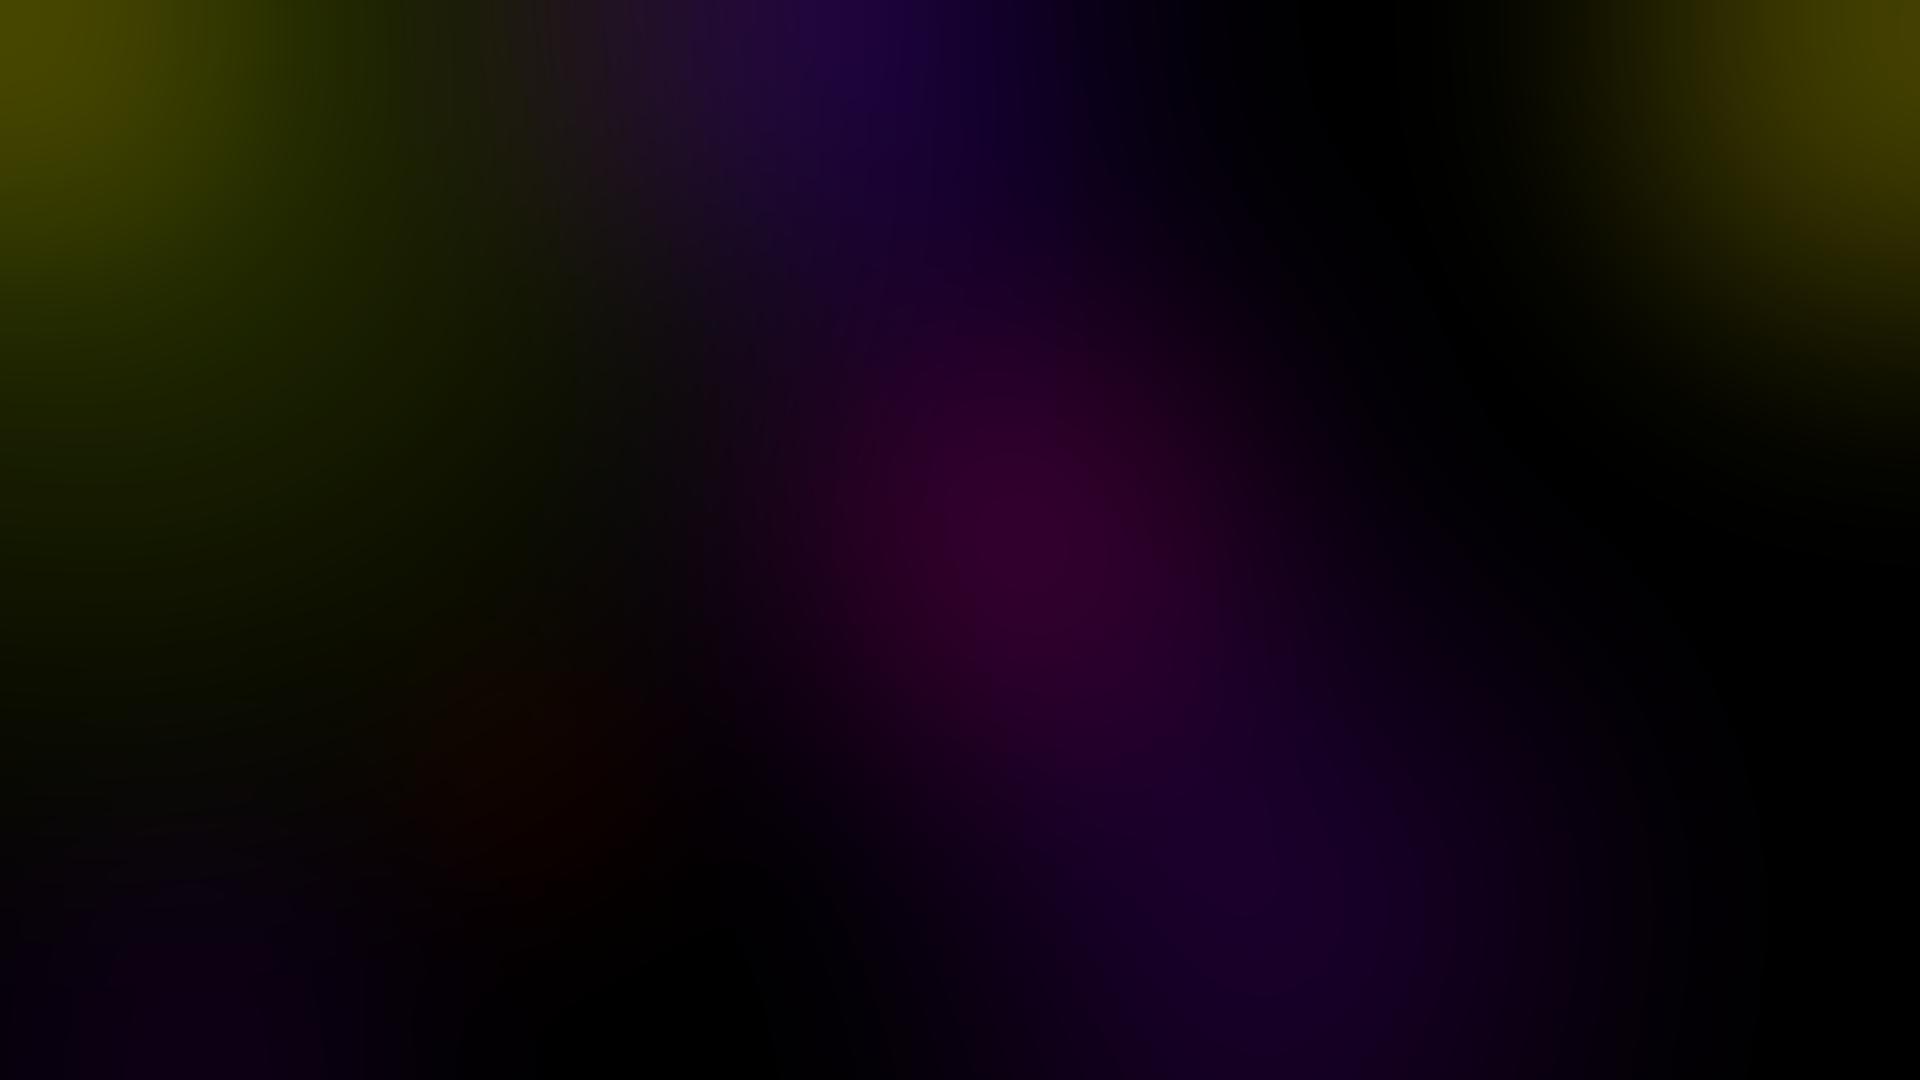 backgrounds twitter black background light 1920x1080 1920x1080